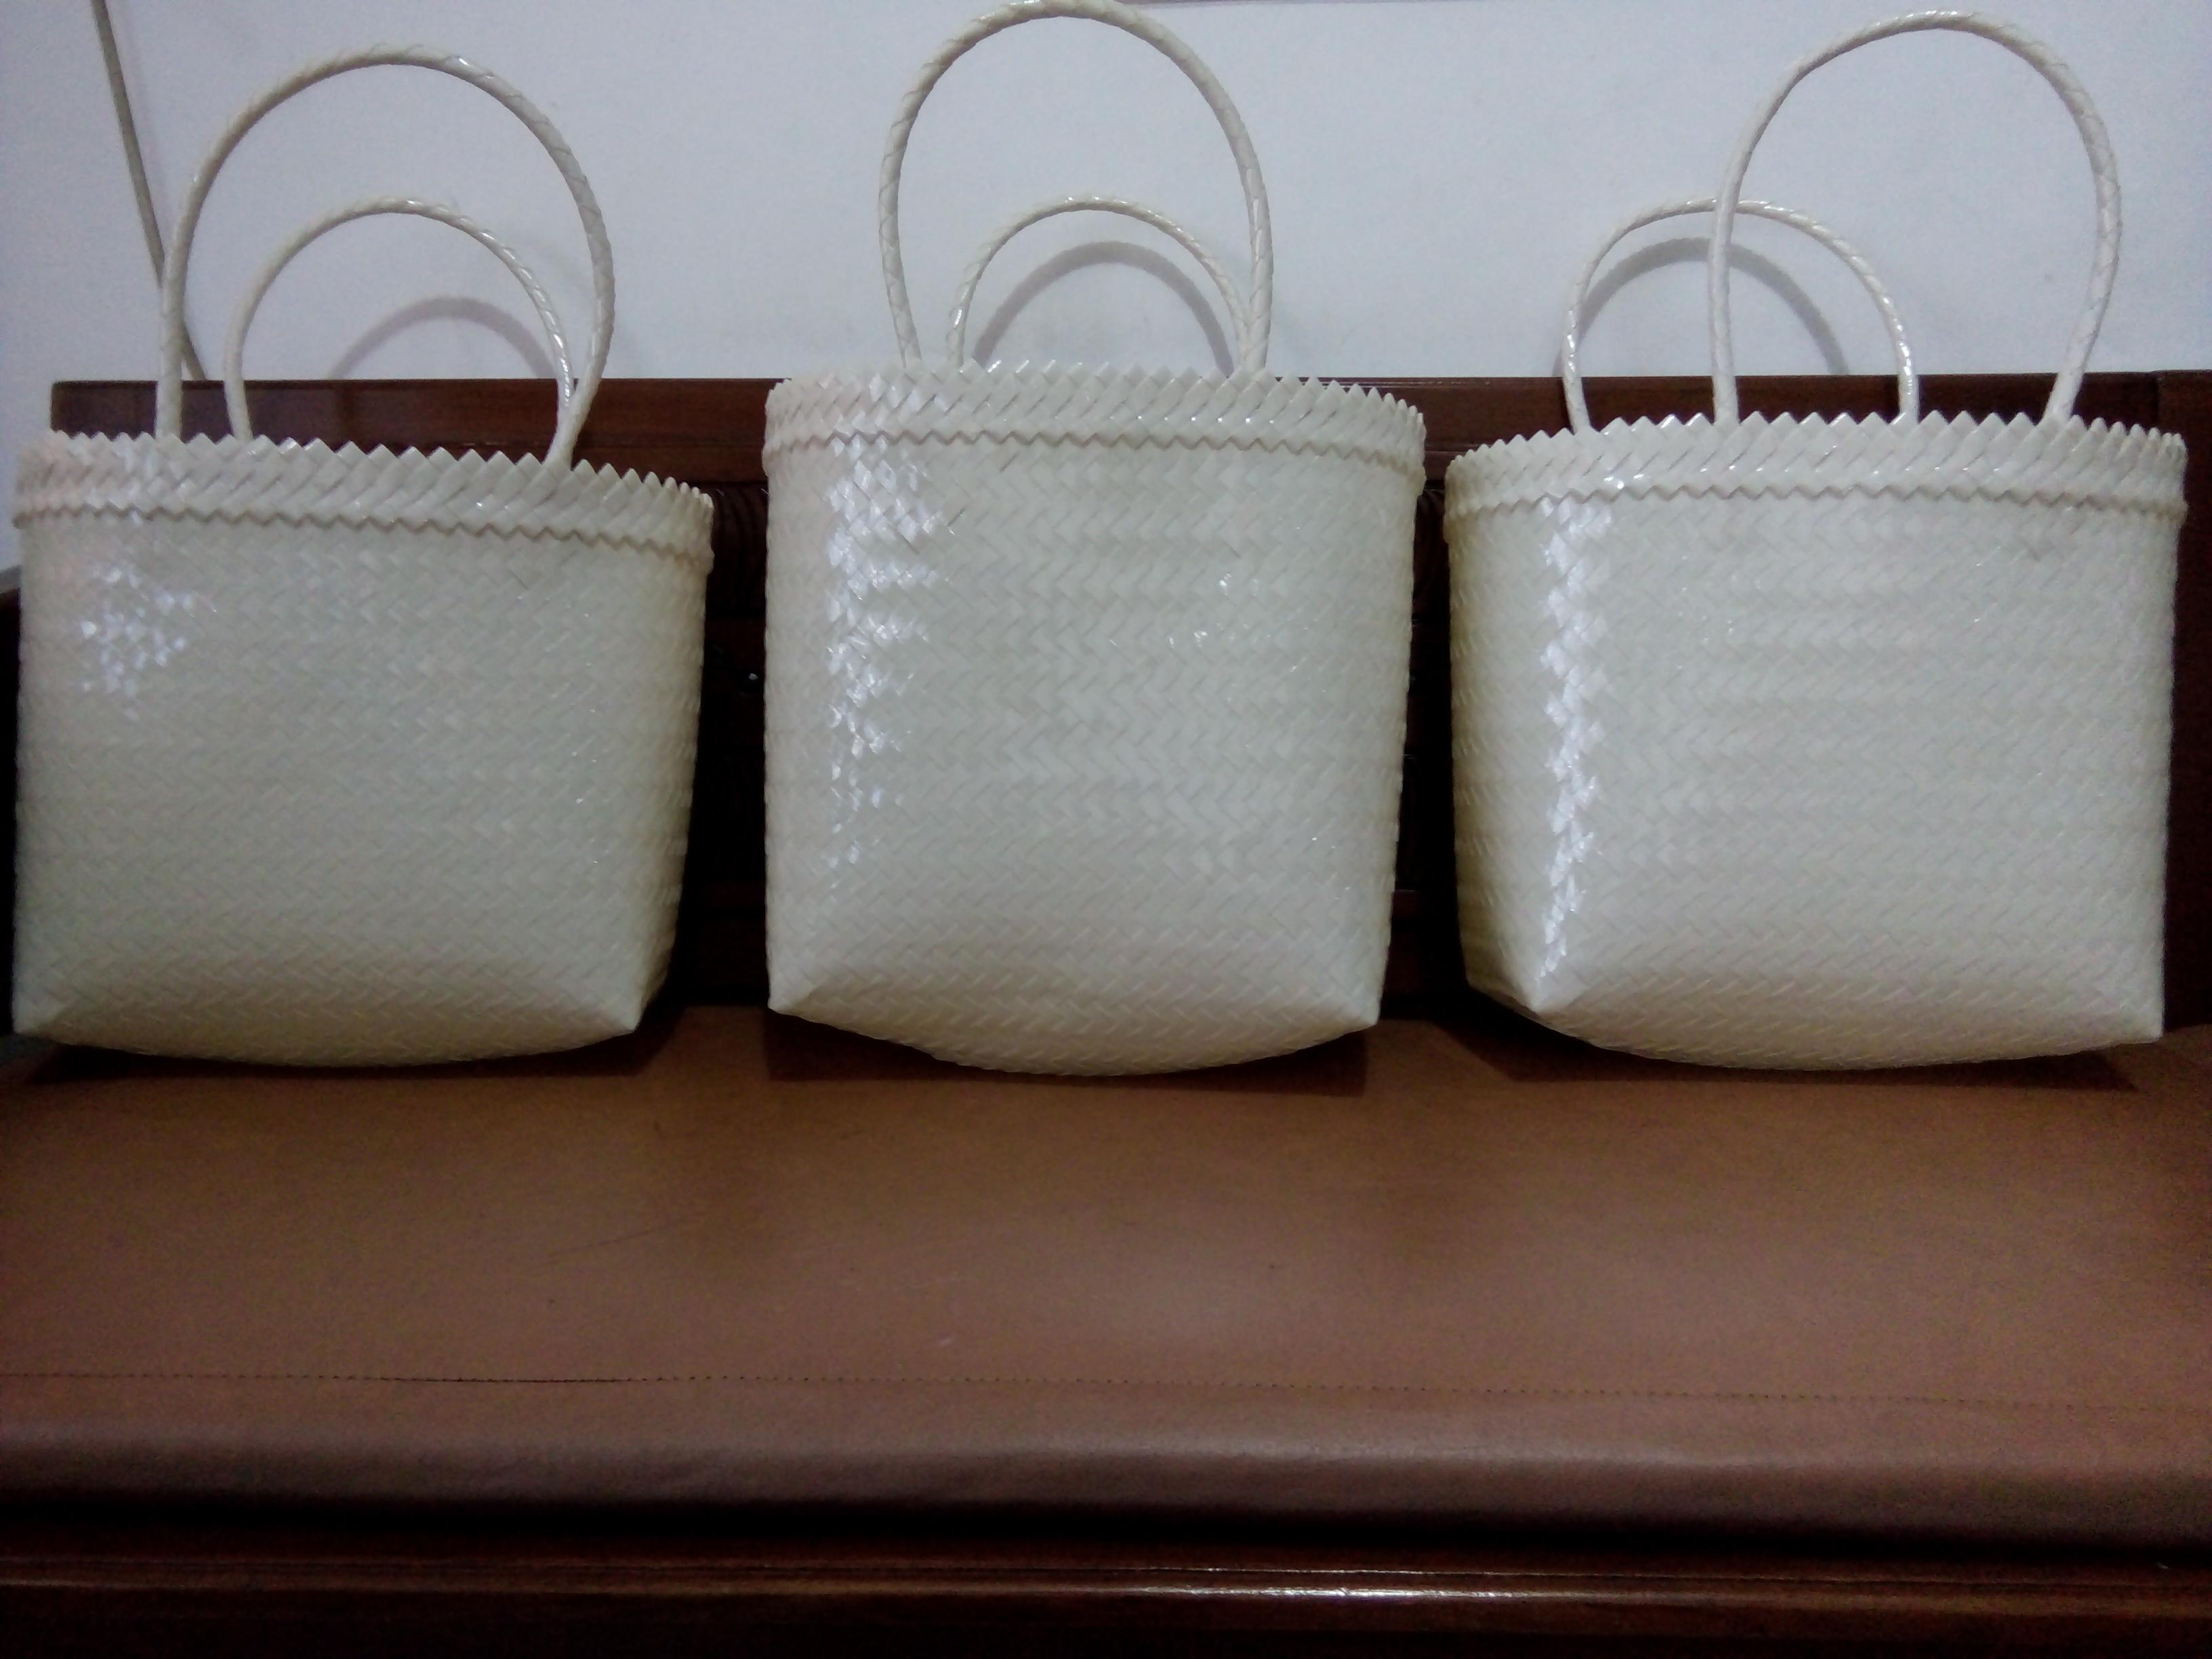 Warna Putih Tas Bening Kaca Polos